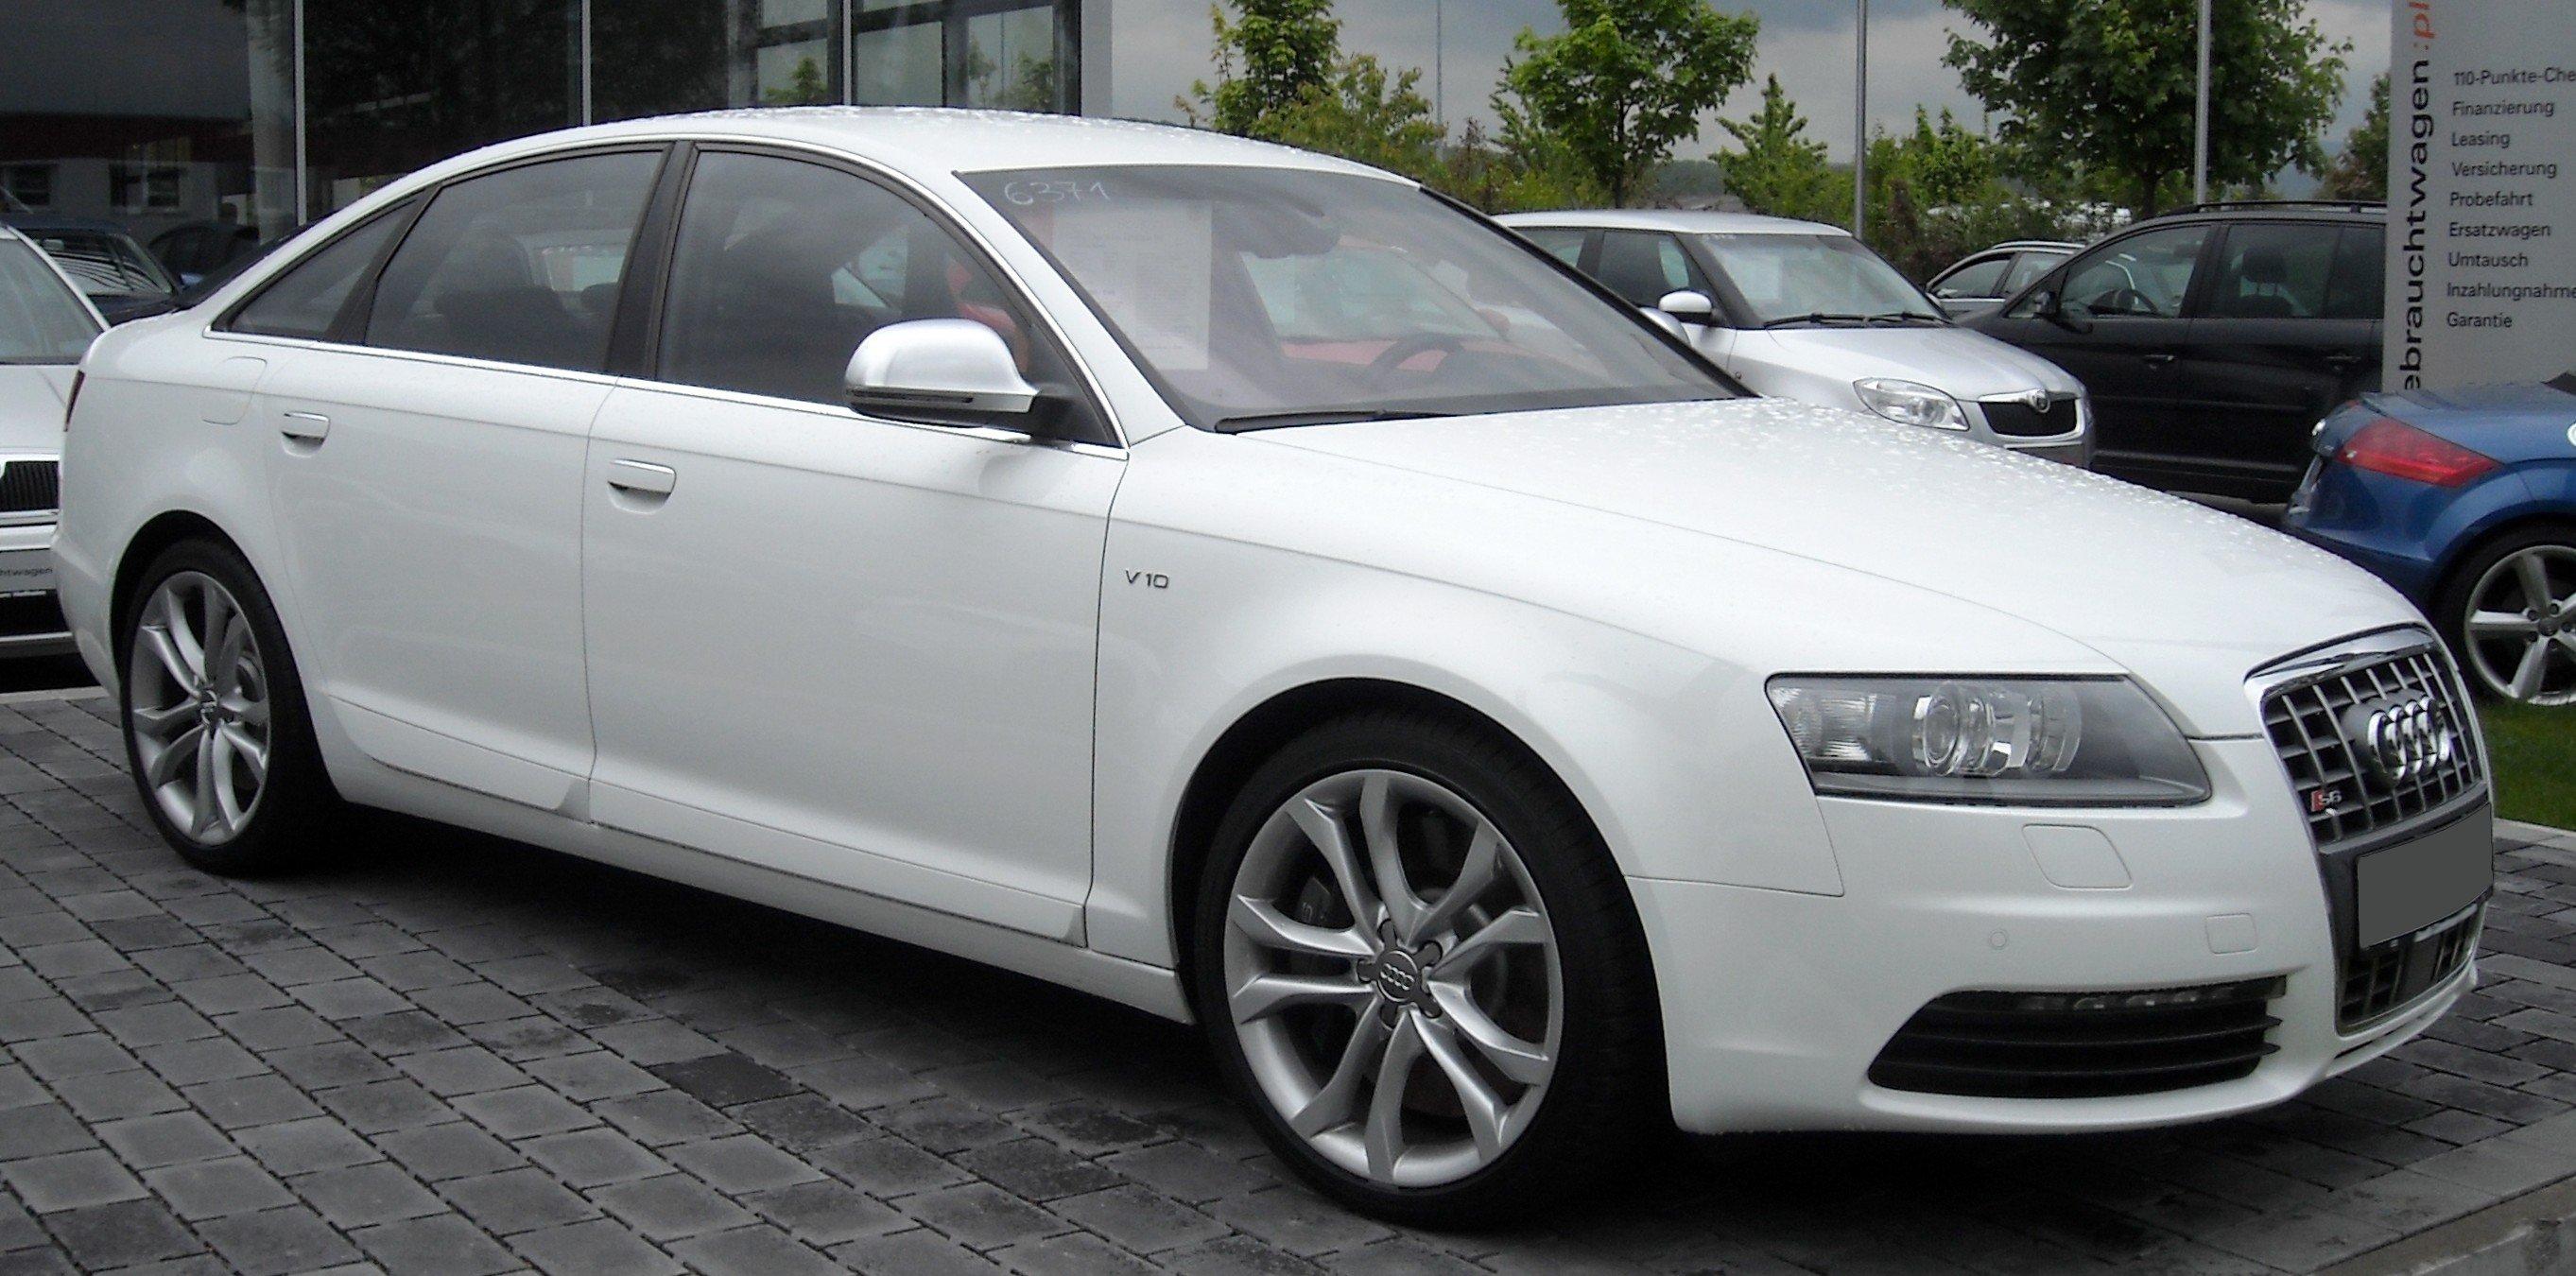 Audi_S6_C6_front_2010_0514.jpg